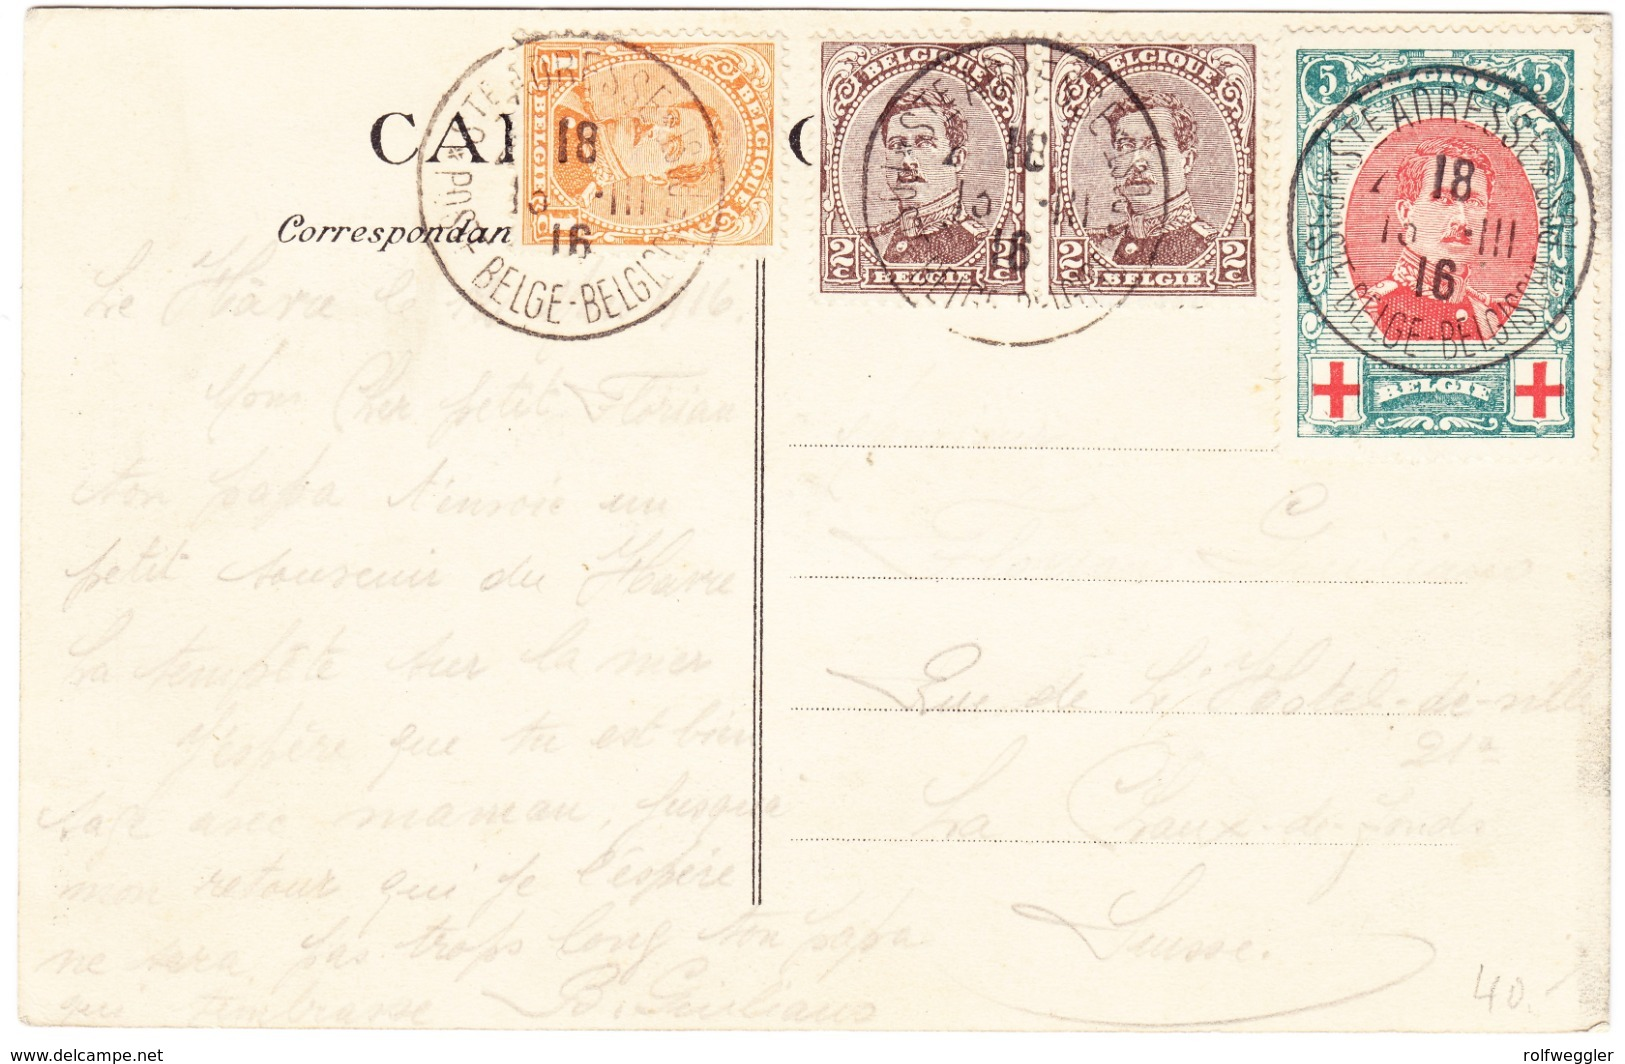 1916 Ak Mit Rotkreuz Marke Aus Saint Adresse Nach La Chaux De Fonds - 1915-1920 Albert I